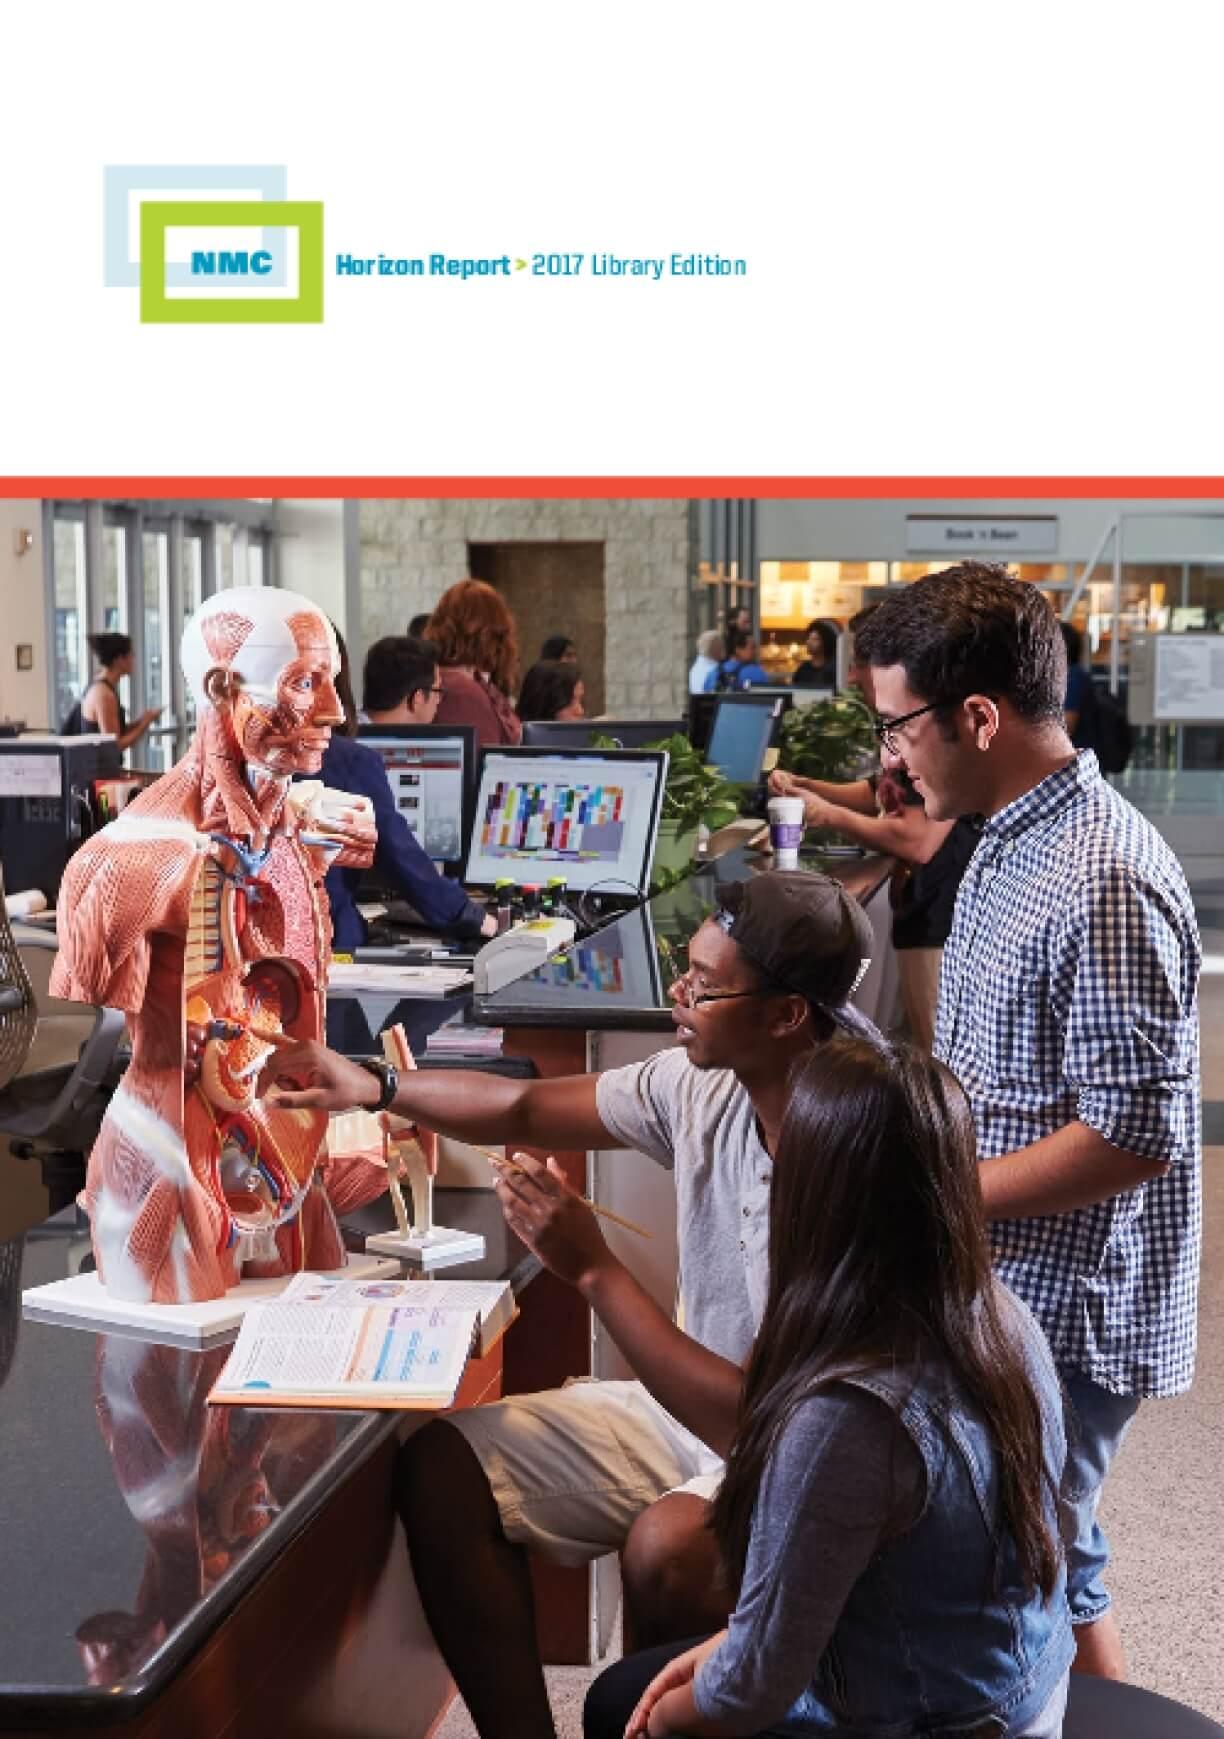 NMC Horizon Report: 2017 Library Edition